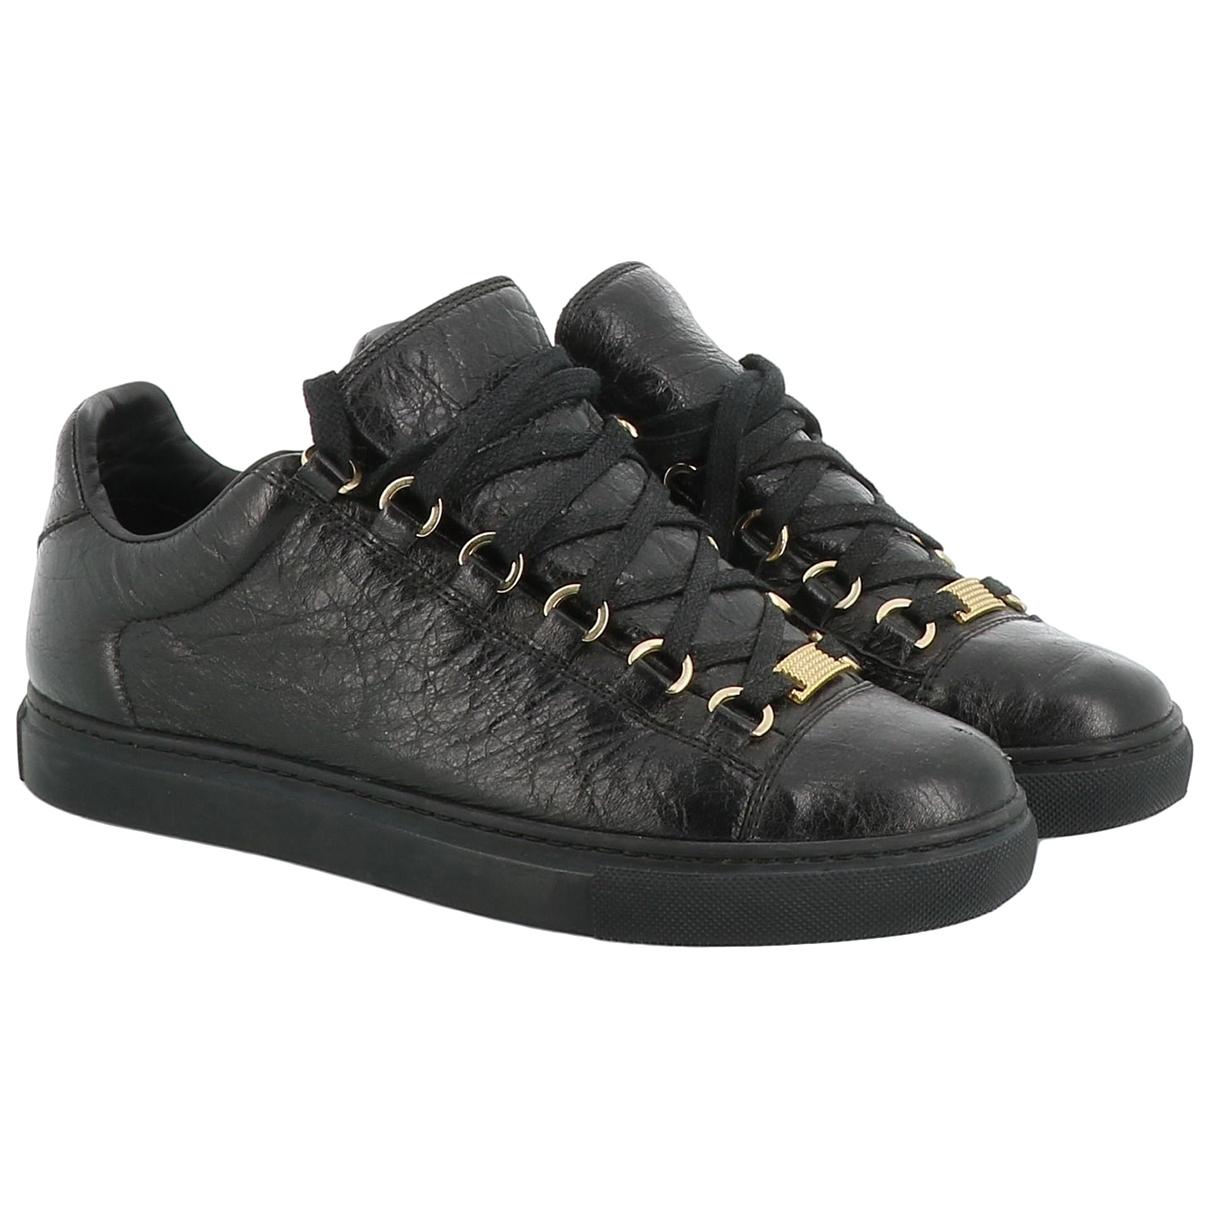 Balenciaga \N Black Leather Trainers for Women 37 EU